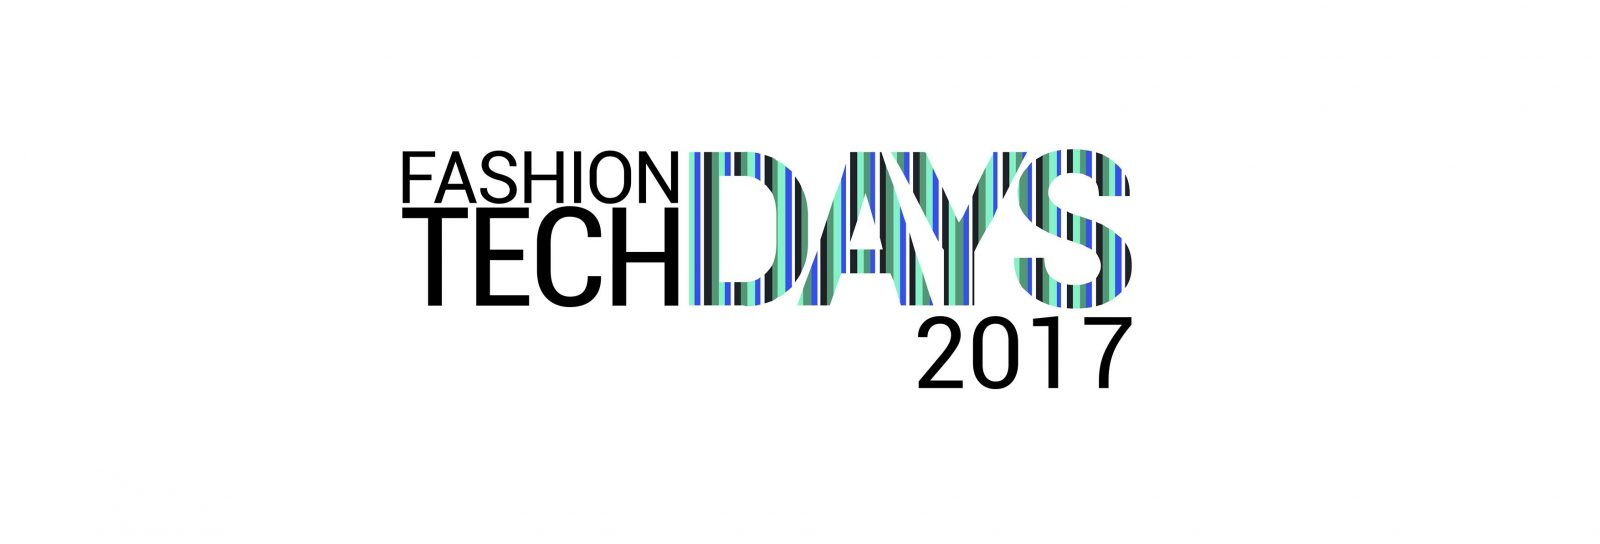 Fashion Tech Days 2017 Roubaix